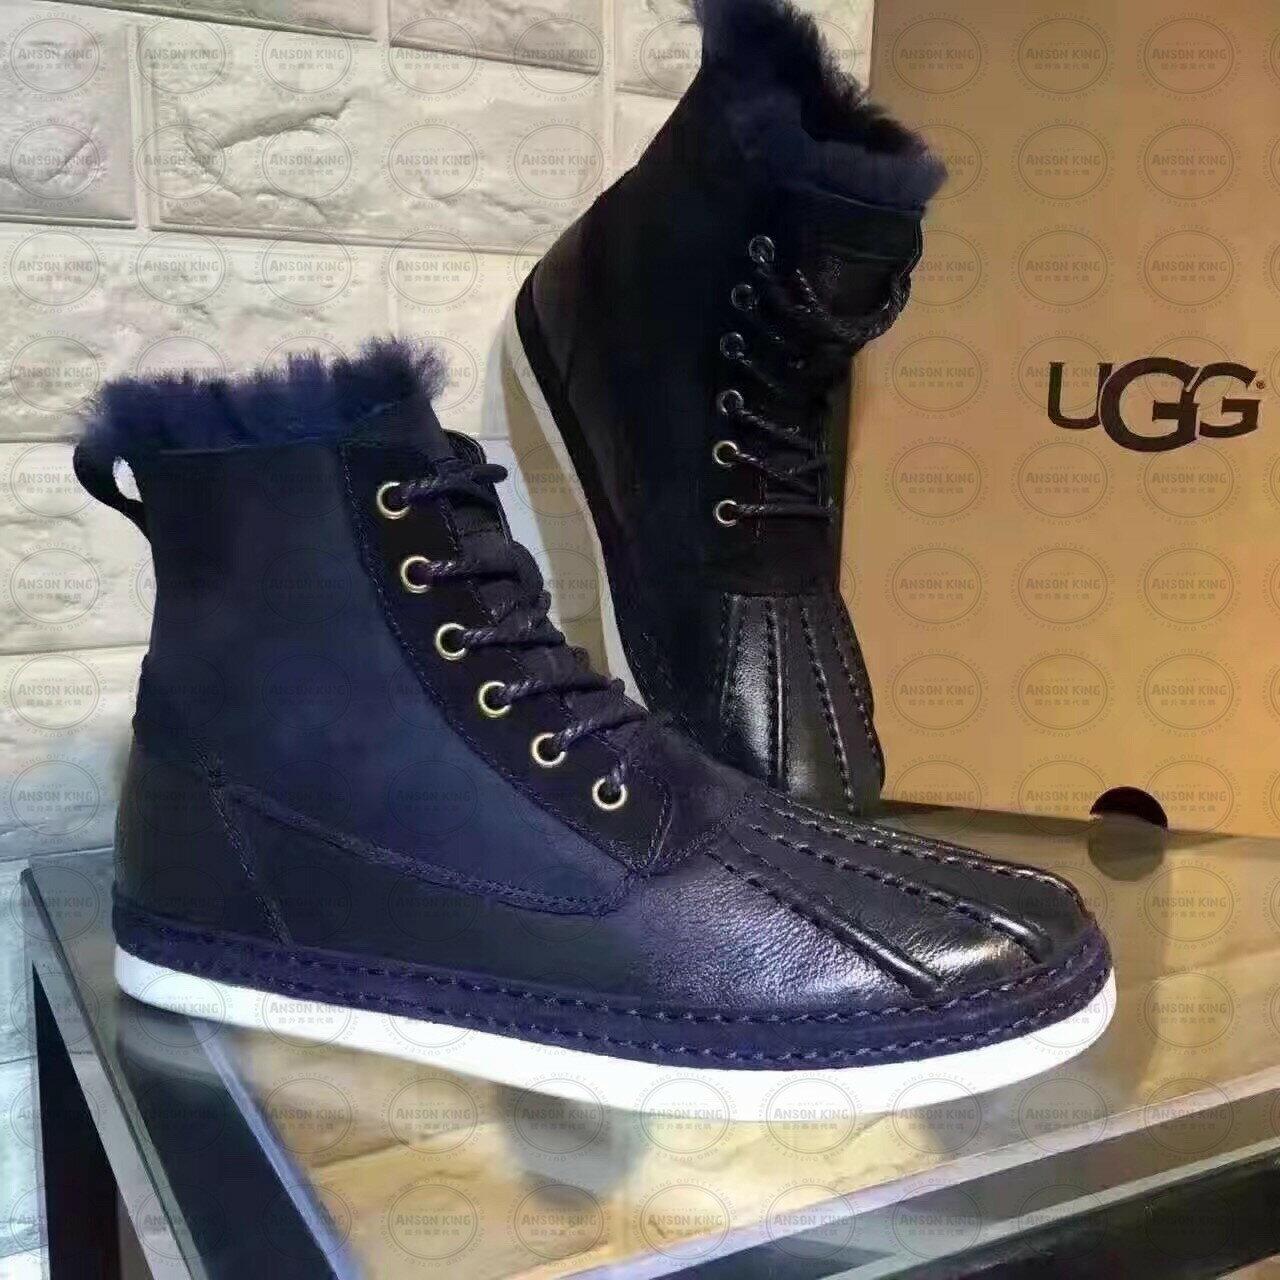 OUTLET正品代購 澳洲 UGG 冬季男款貝殼頭馬丁靴 短靴 保暖 真皮羊皮毛 雪靴 短靴 深藍 0